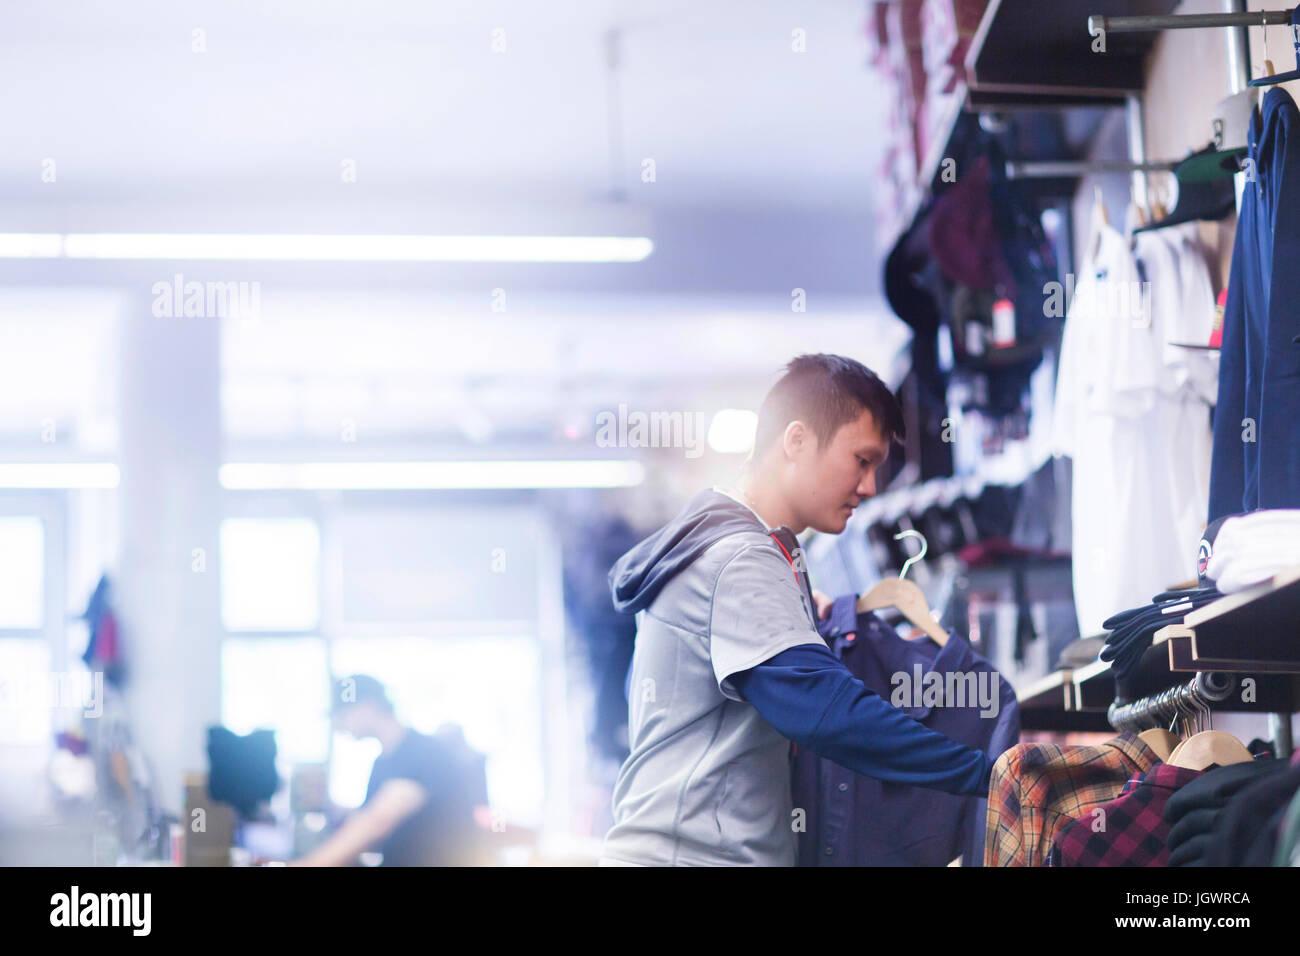 Junge männliche Skater Shirt im Skateboard Shop betrachten Stockbild